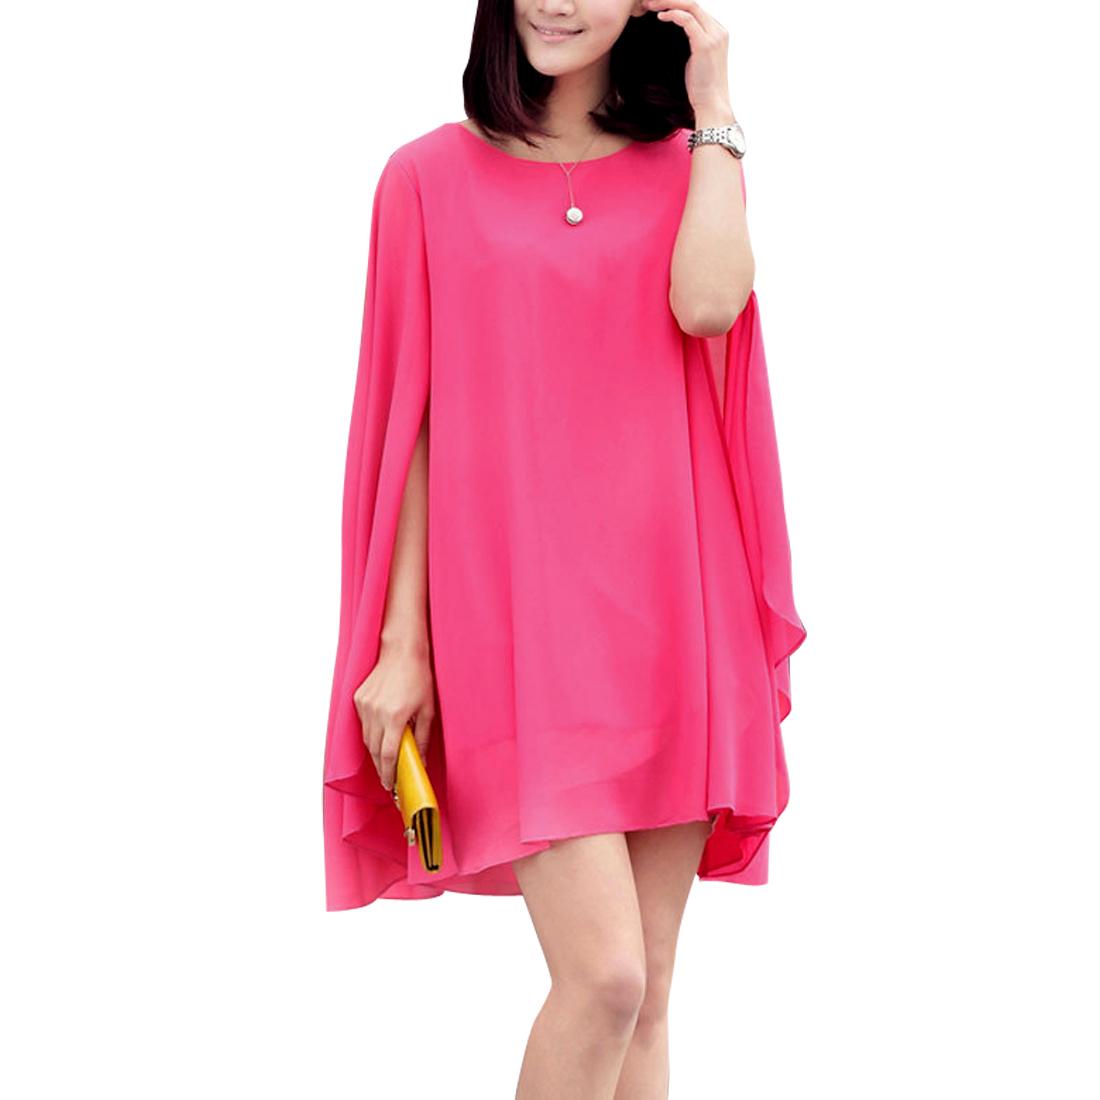 Ladies Round Neck Sleeveless Cape Design Dress Fuchsia S